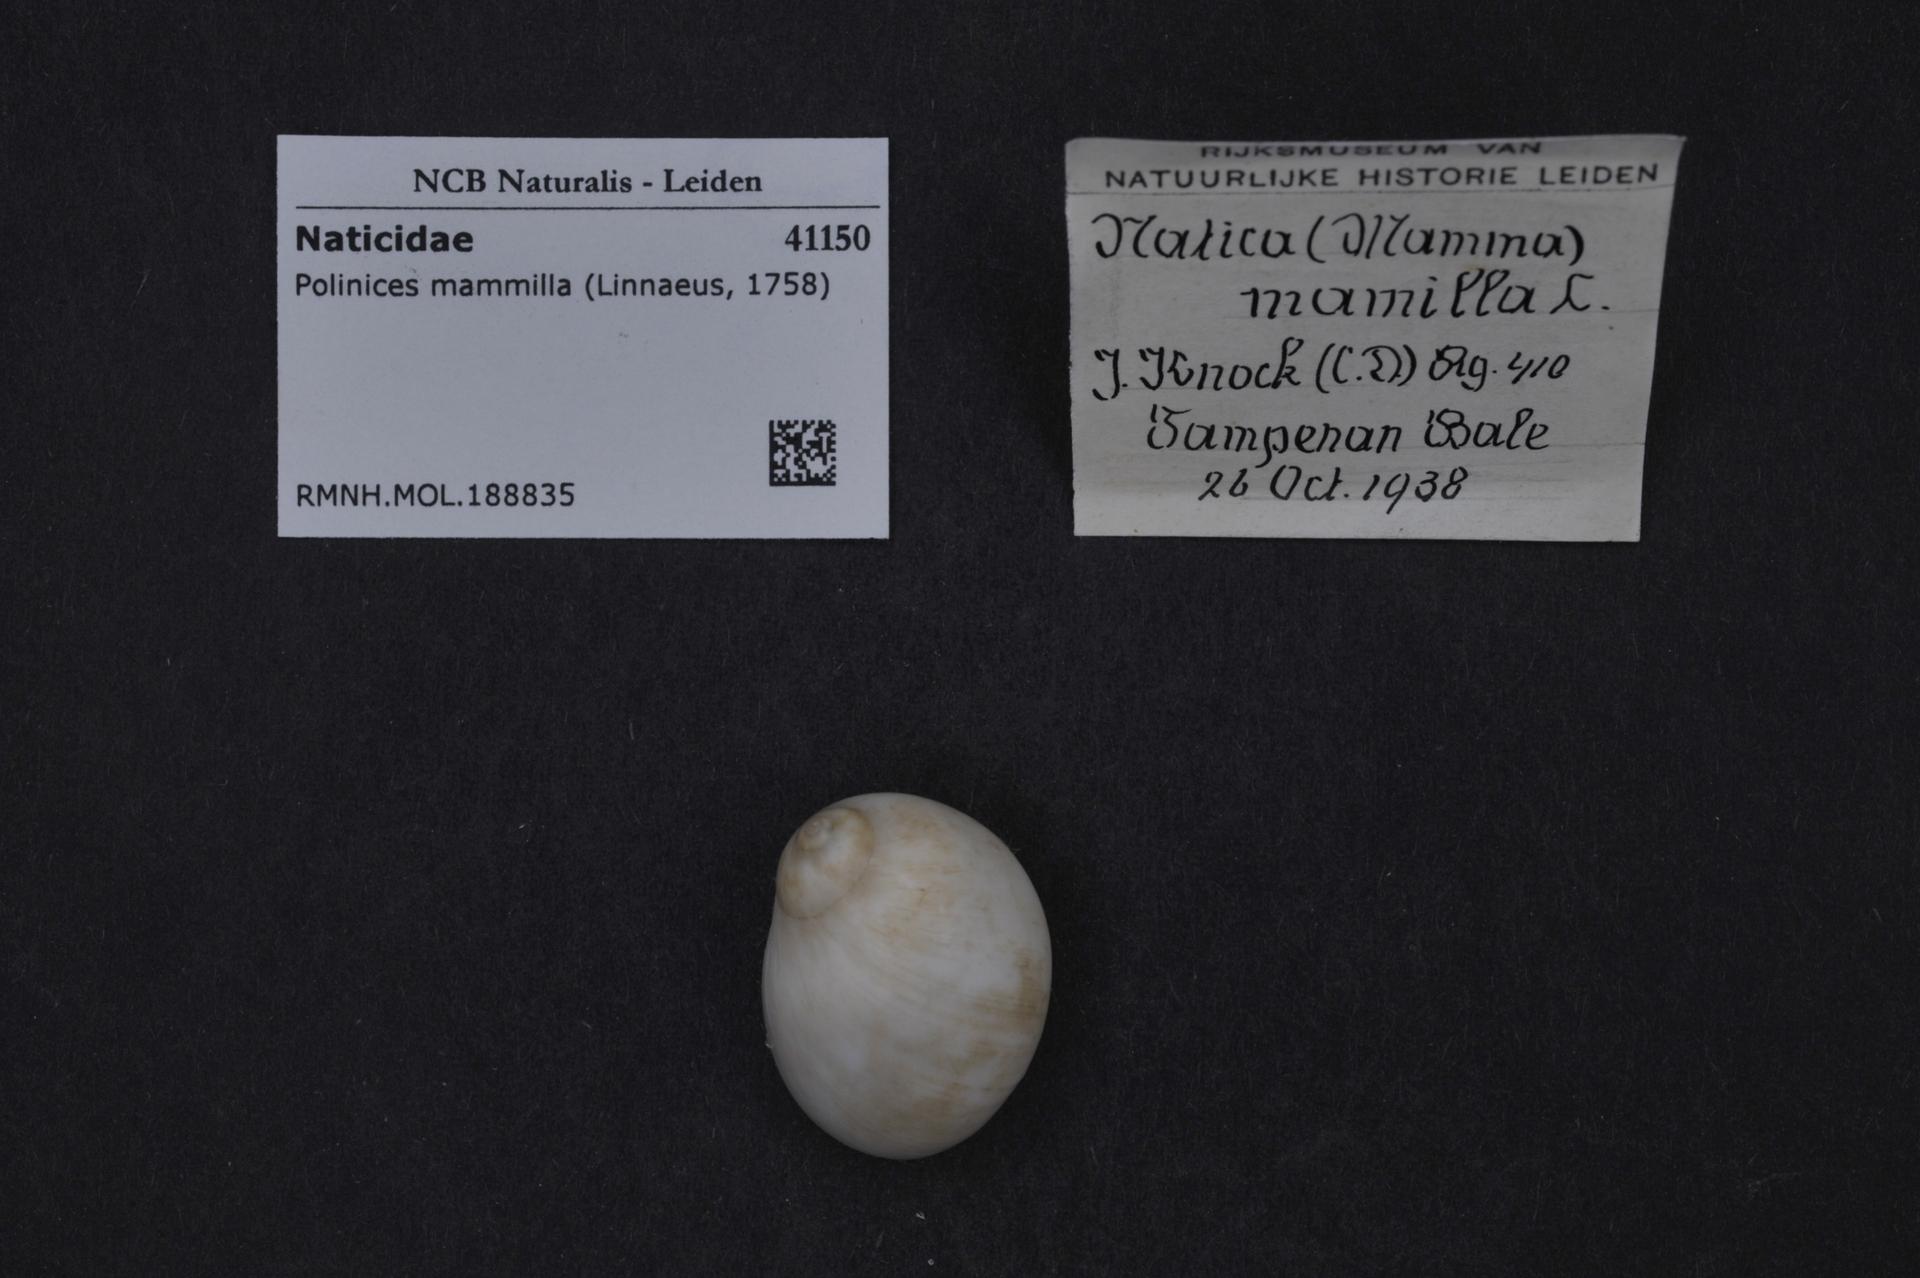 RMNH.MOL.188835 | Polinices mammilla (Linnaeus, 1758)